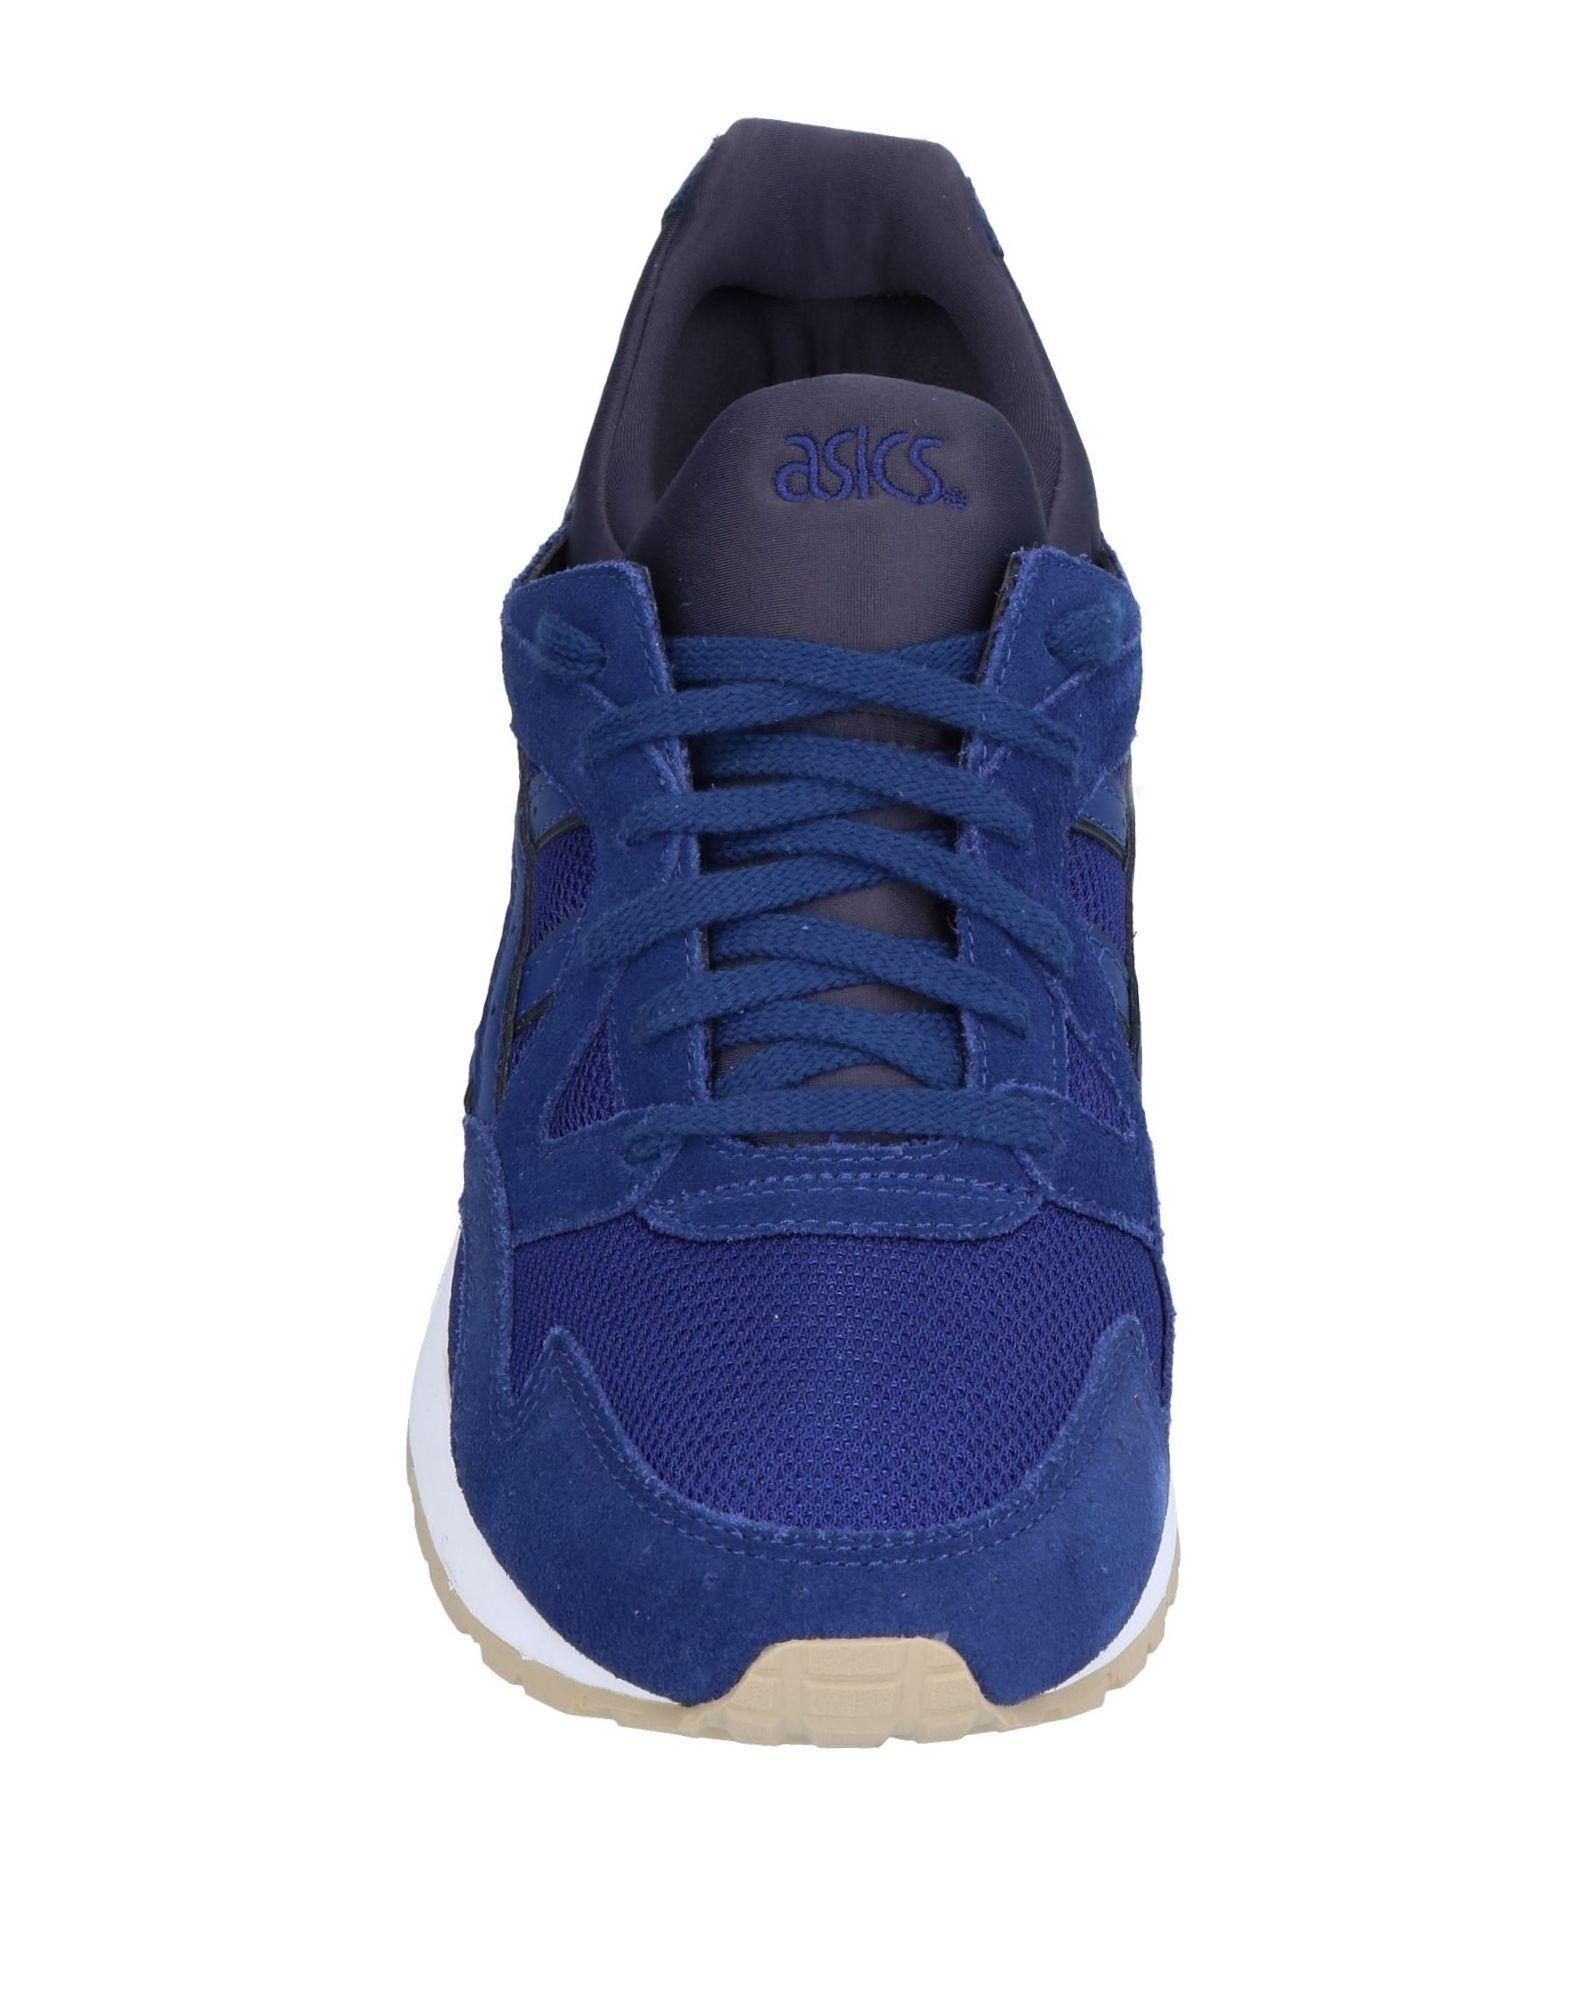 Rabatt echte Asics Schuhe Asics echte Sneakers Herren  11398713MK 12f6bf